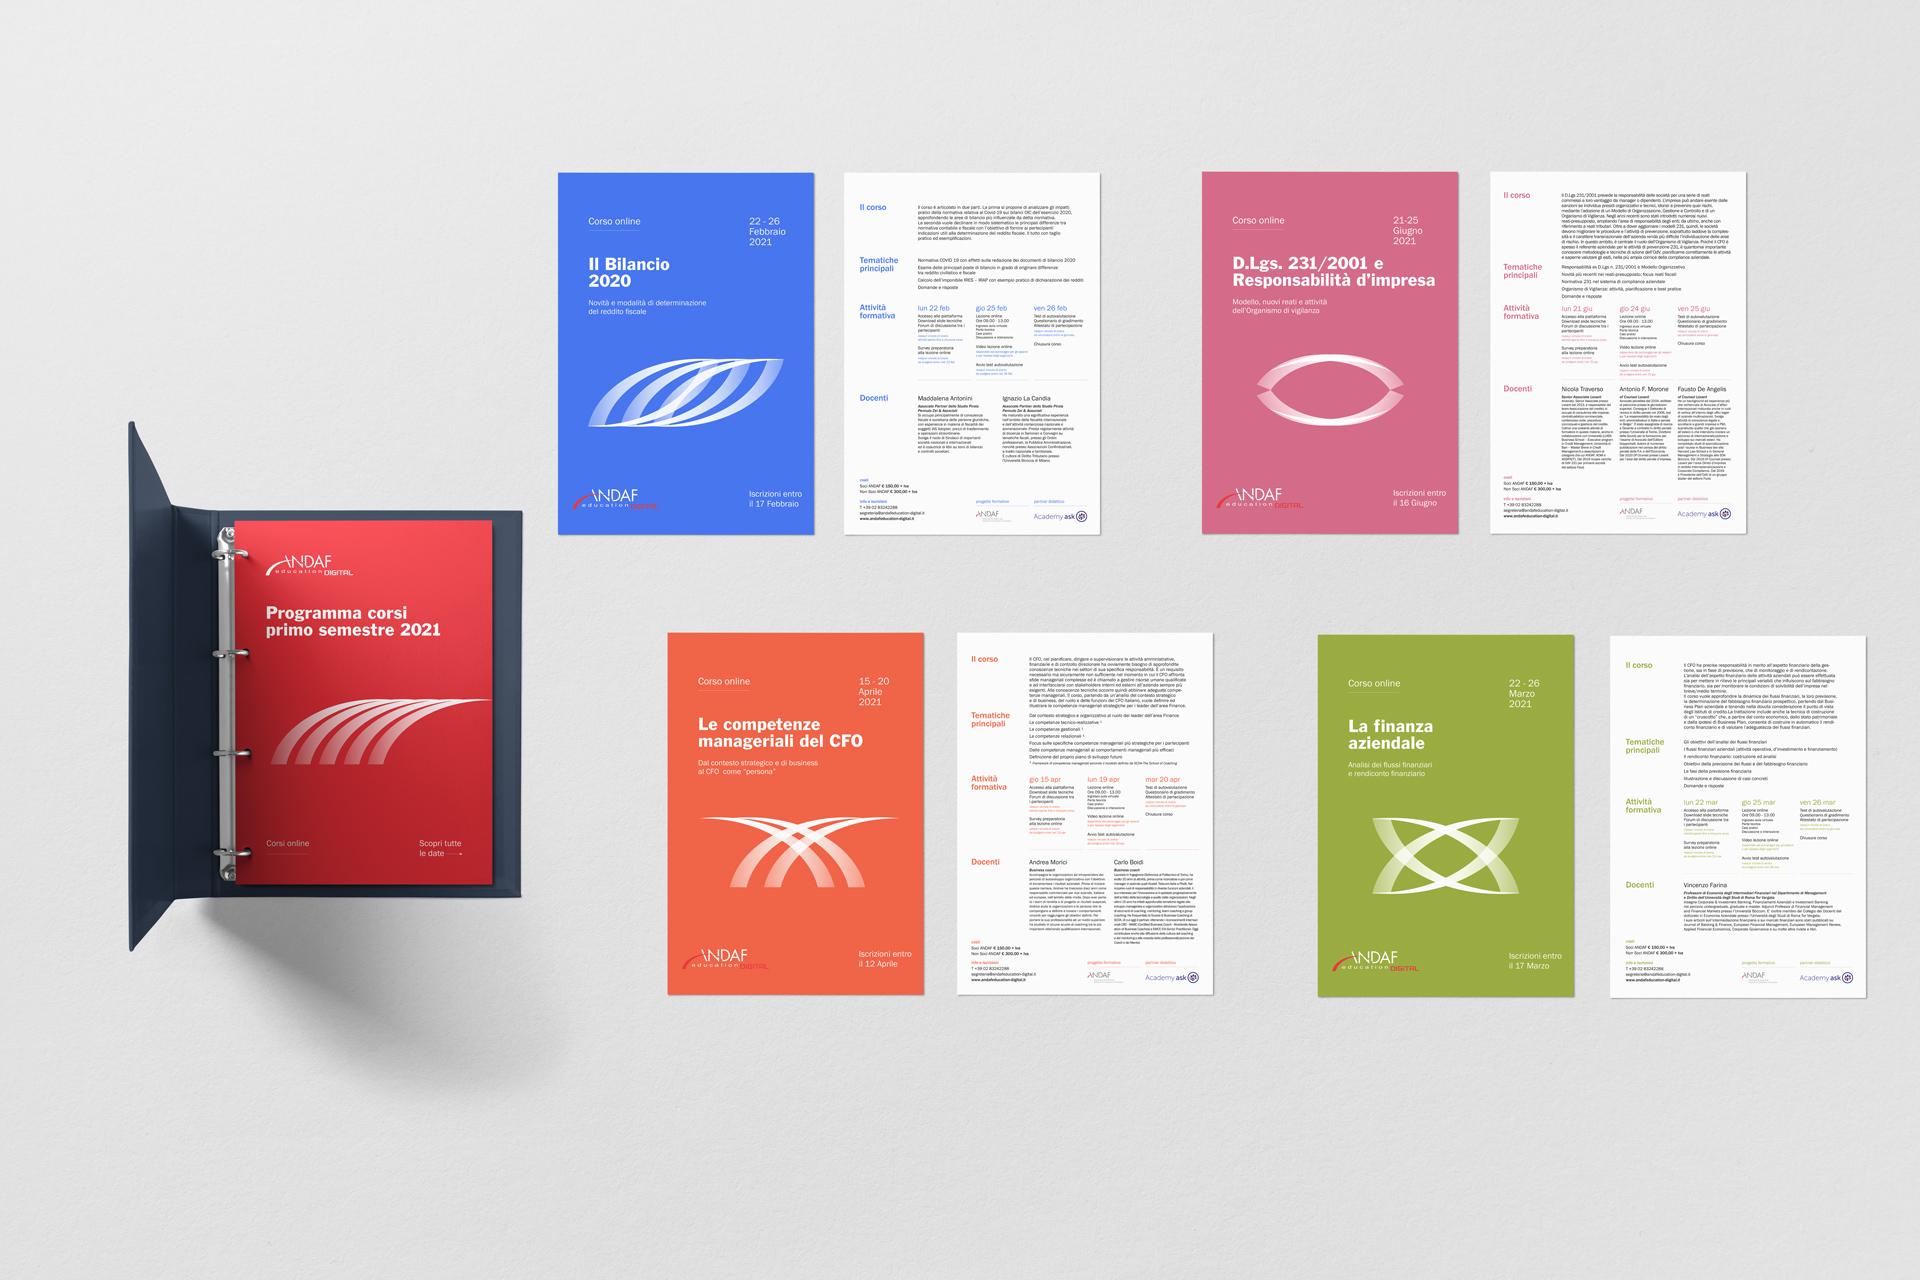 Andaf visual design graphic flyers drogheria studio identity